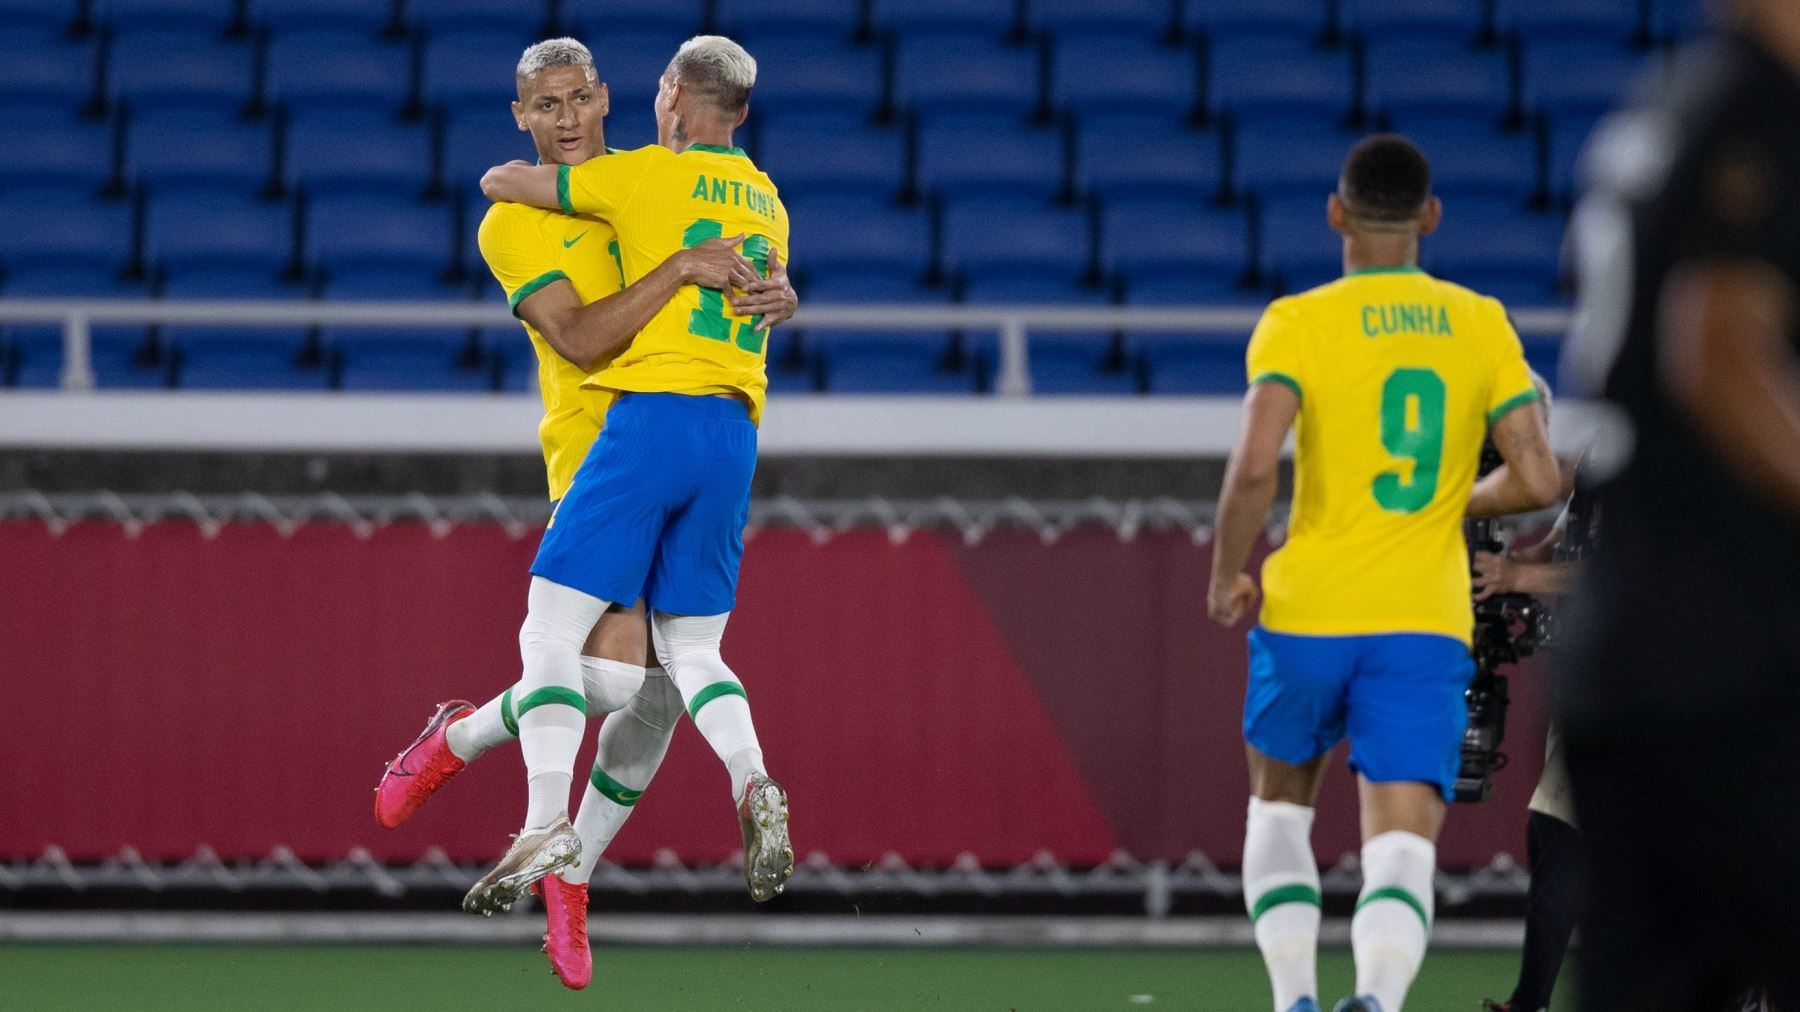 Tokio 2020: Con un brillantes Richarlison, Brasil derrota 4-2 a  Alemania